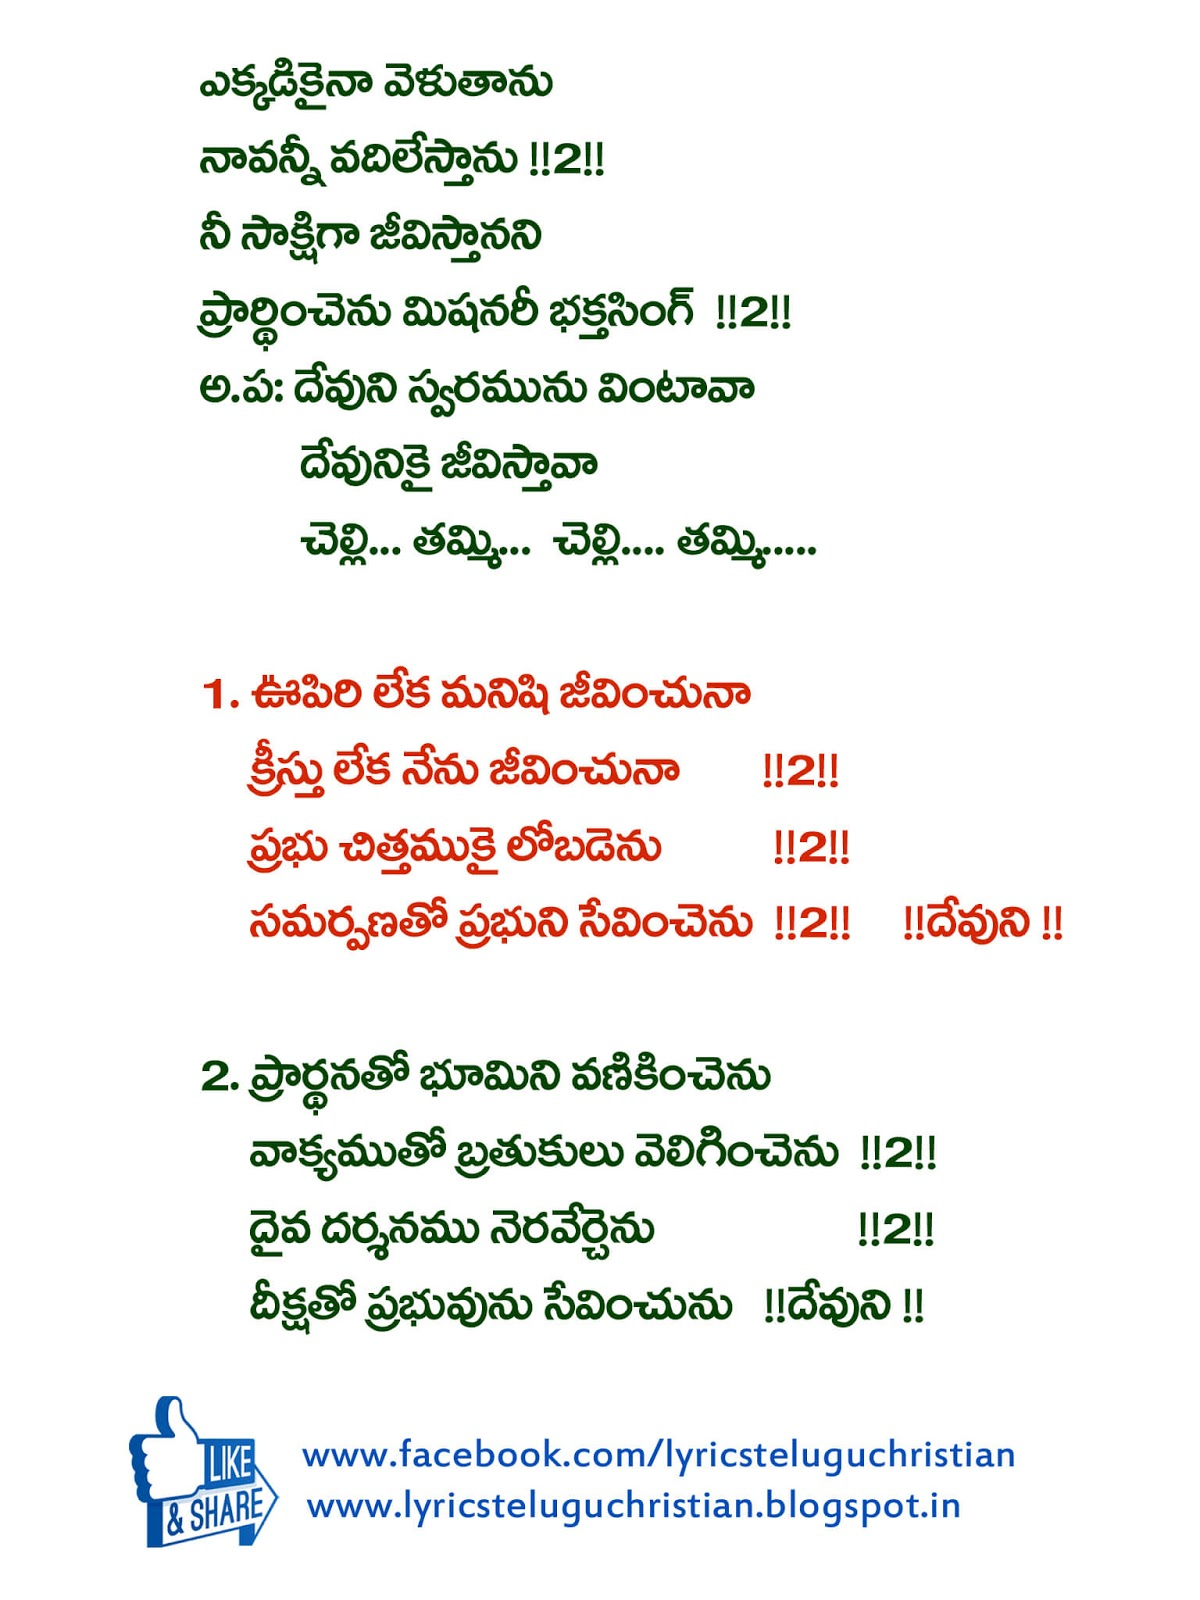 Sunday school songs in telugu lyrics